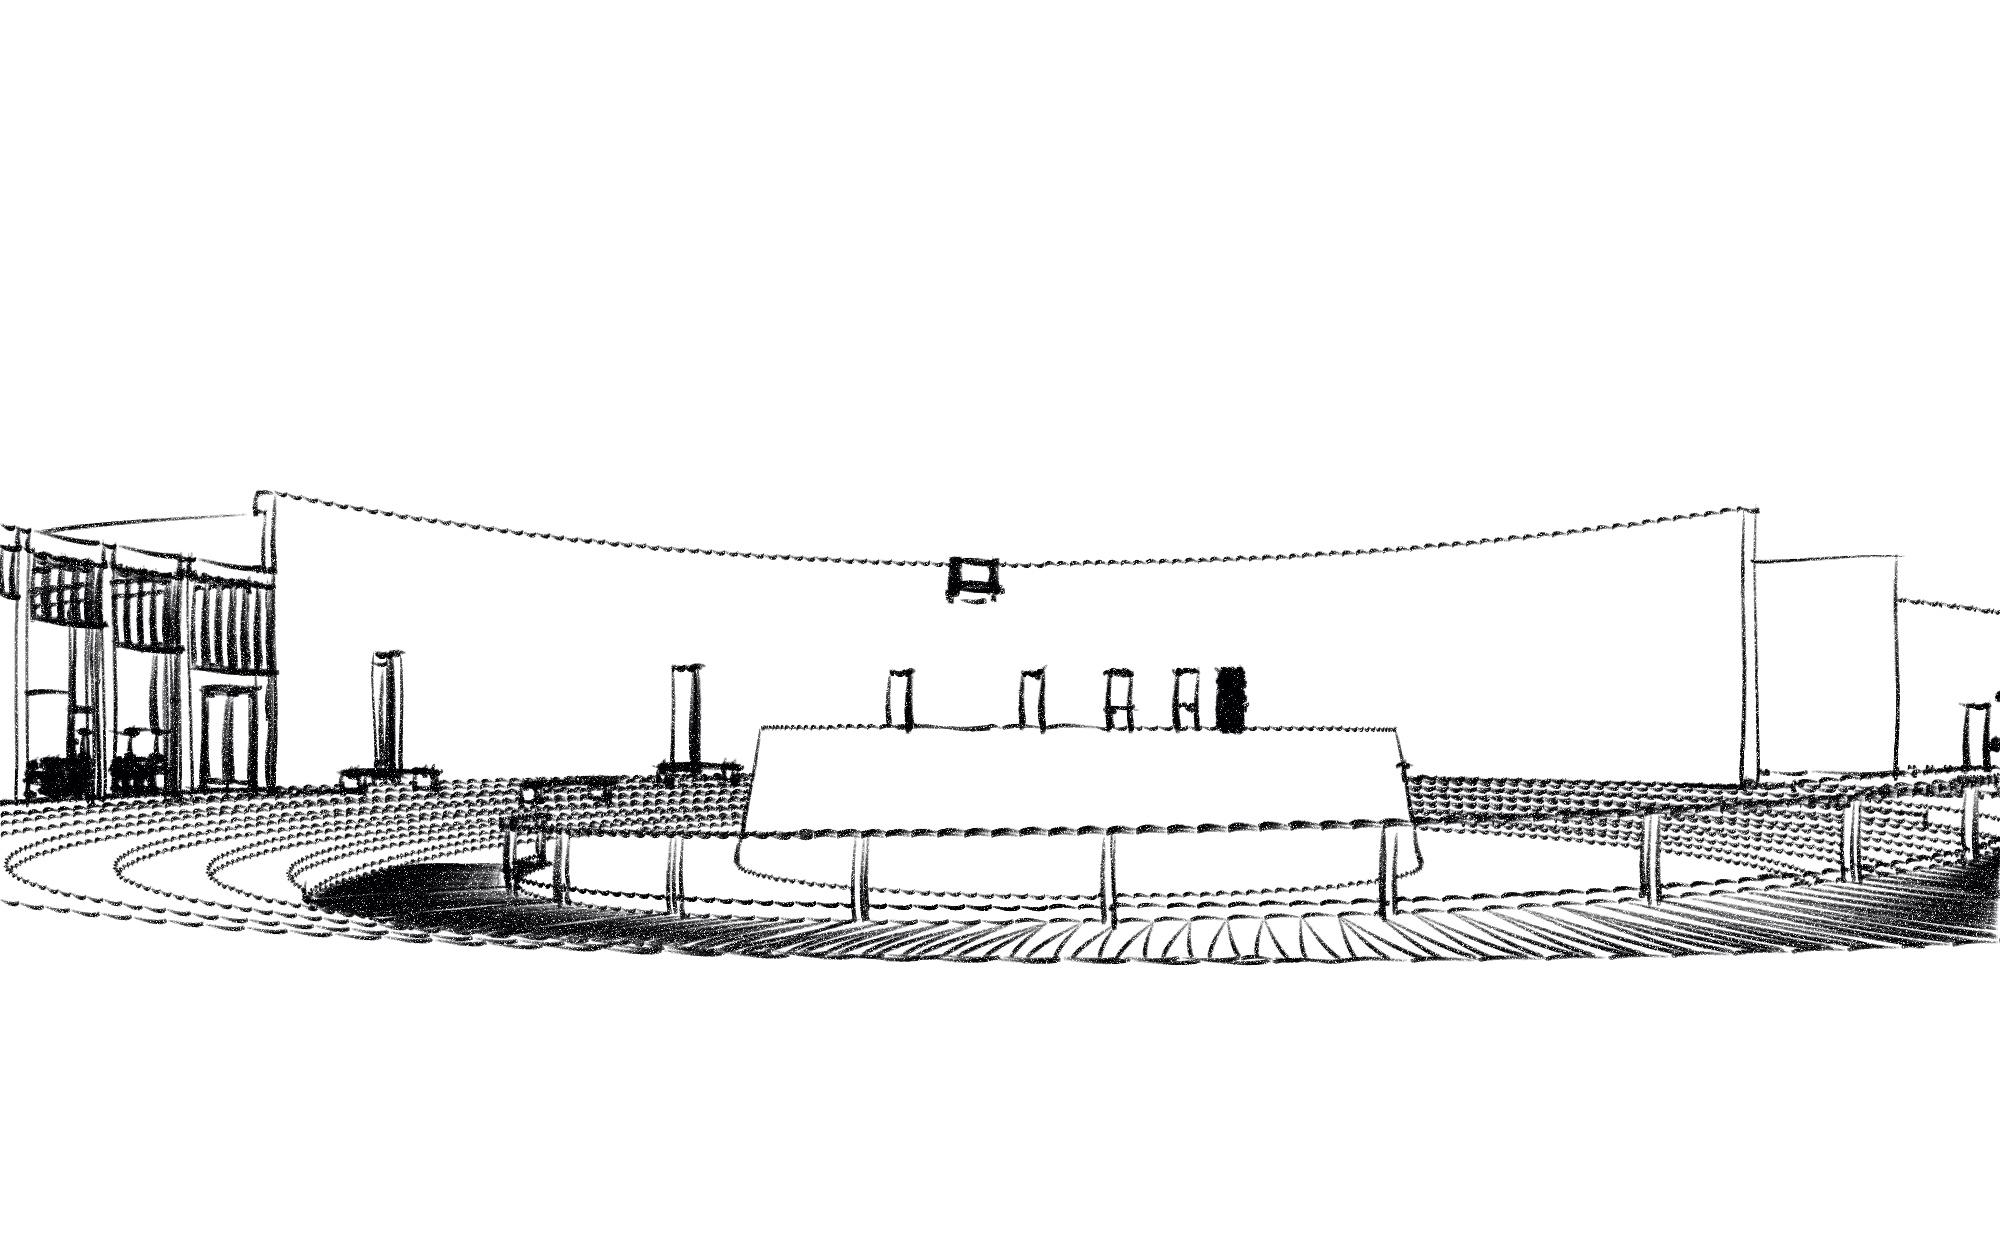 04 Yard Sketch.jpg